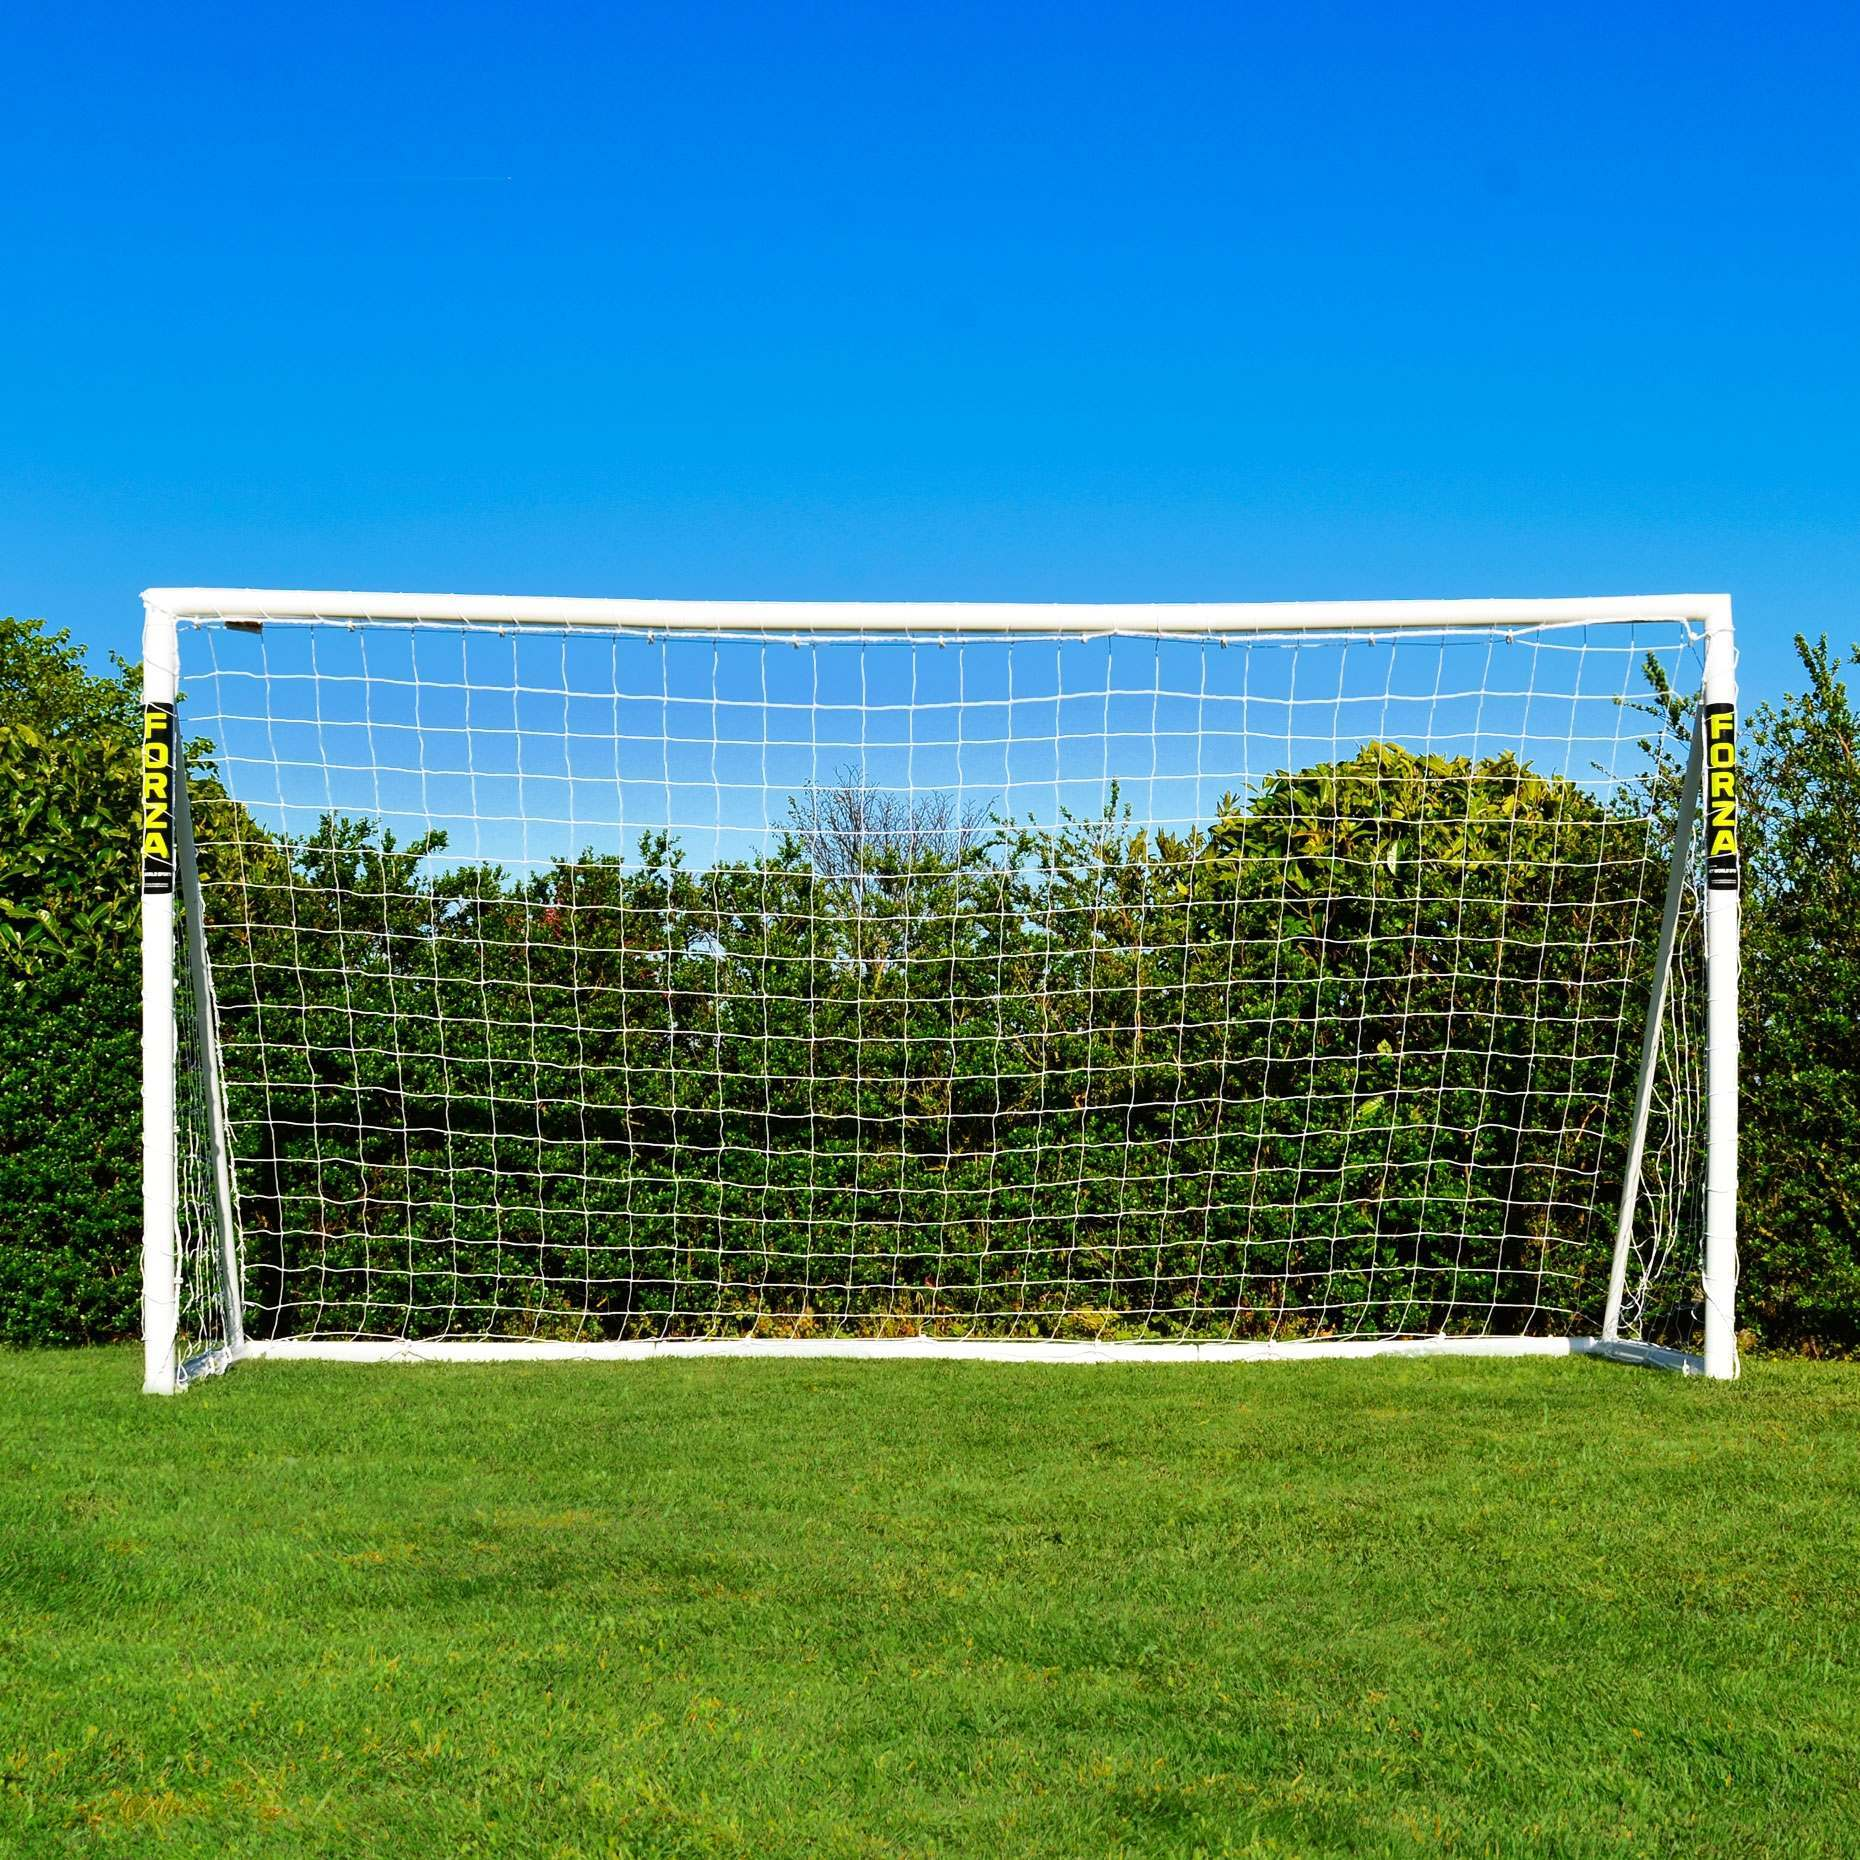 12 X 6 Forza Football Goal Post